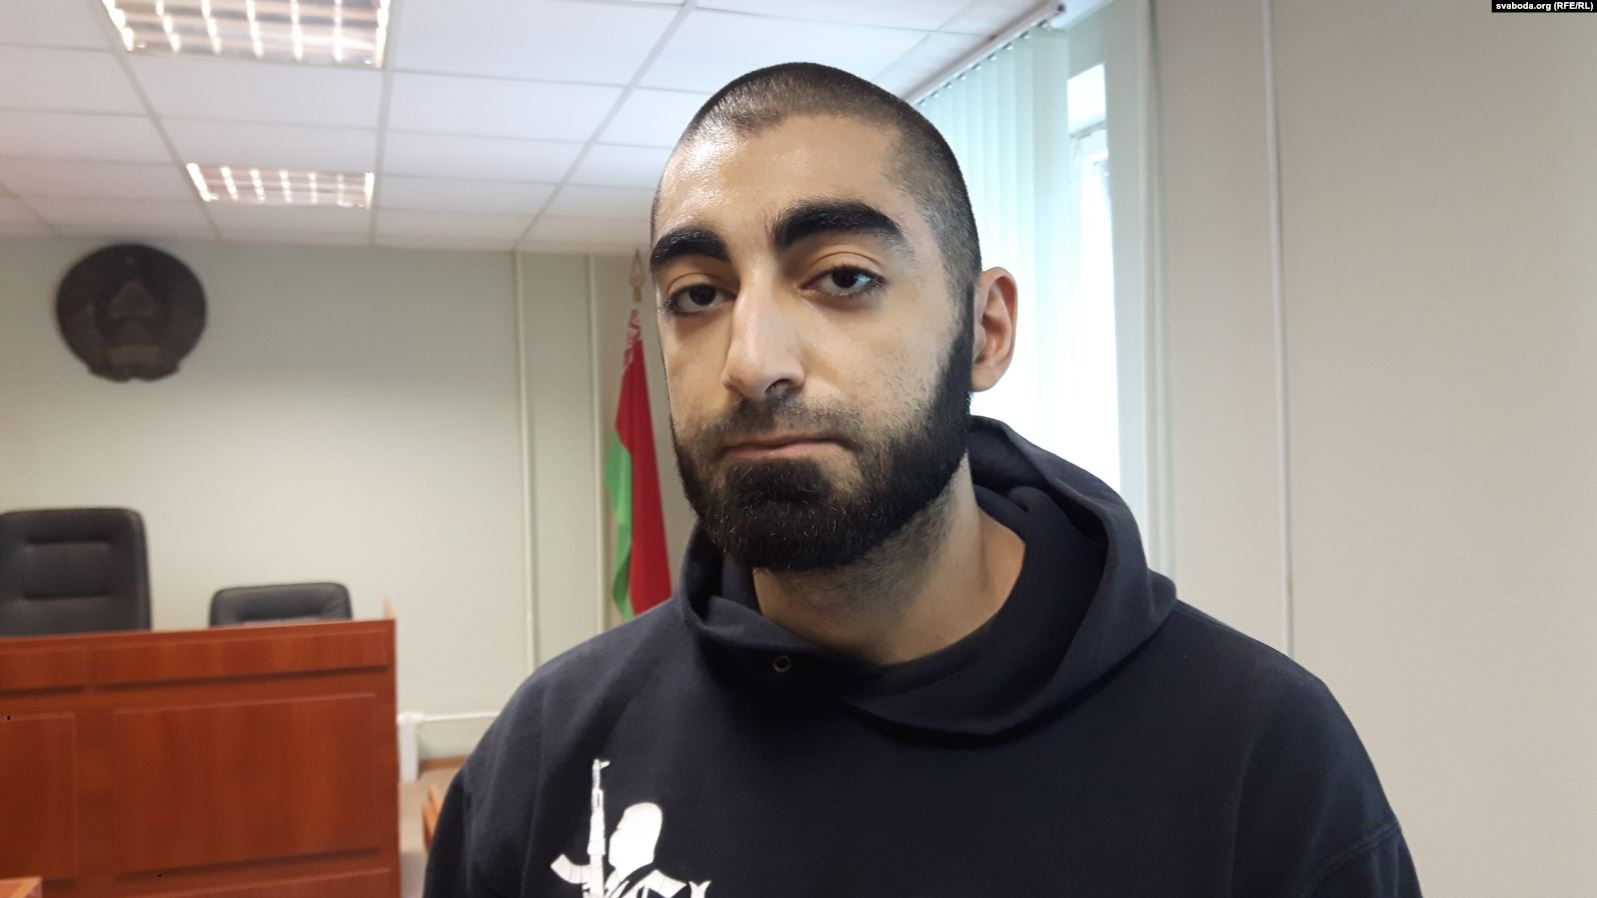 Raman Khalilau i domstol